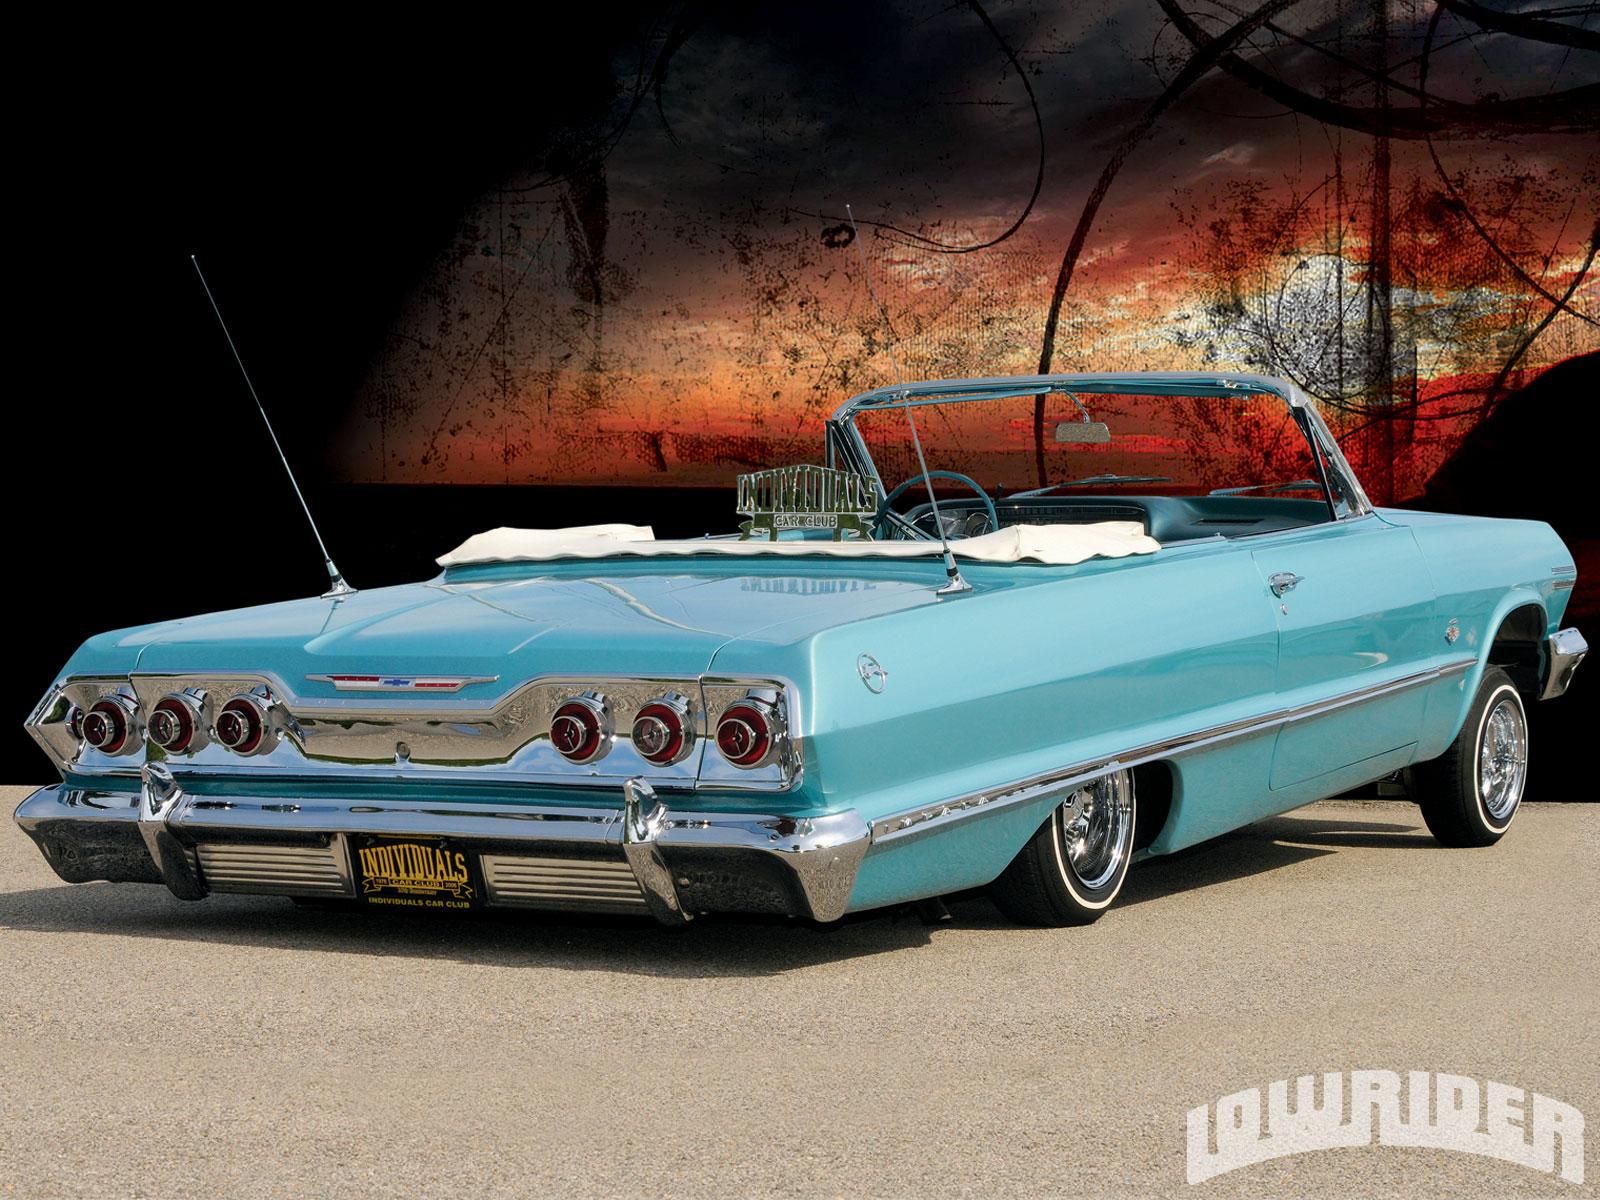 1963 Chevrolet Impala Lowrider Magazine